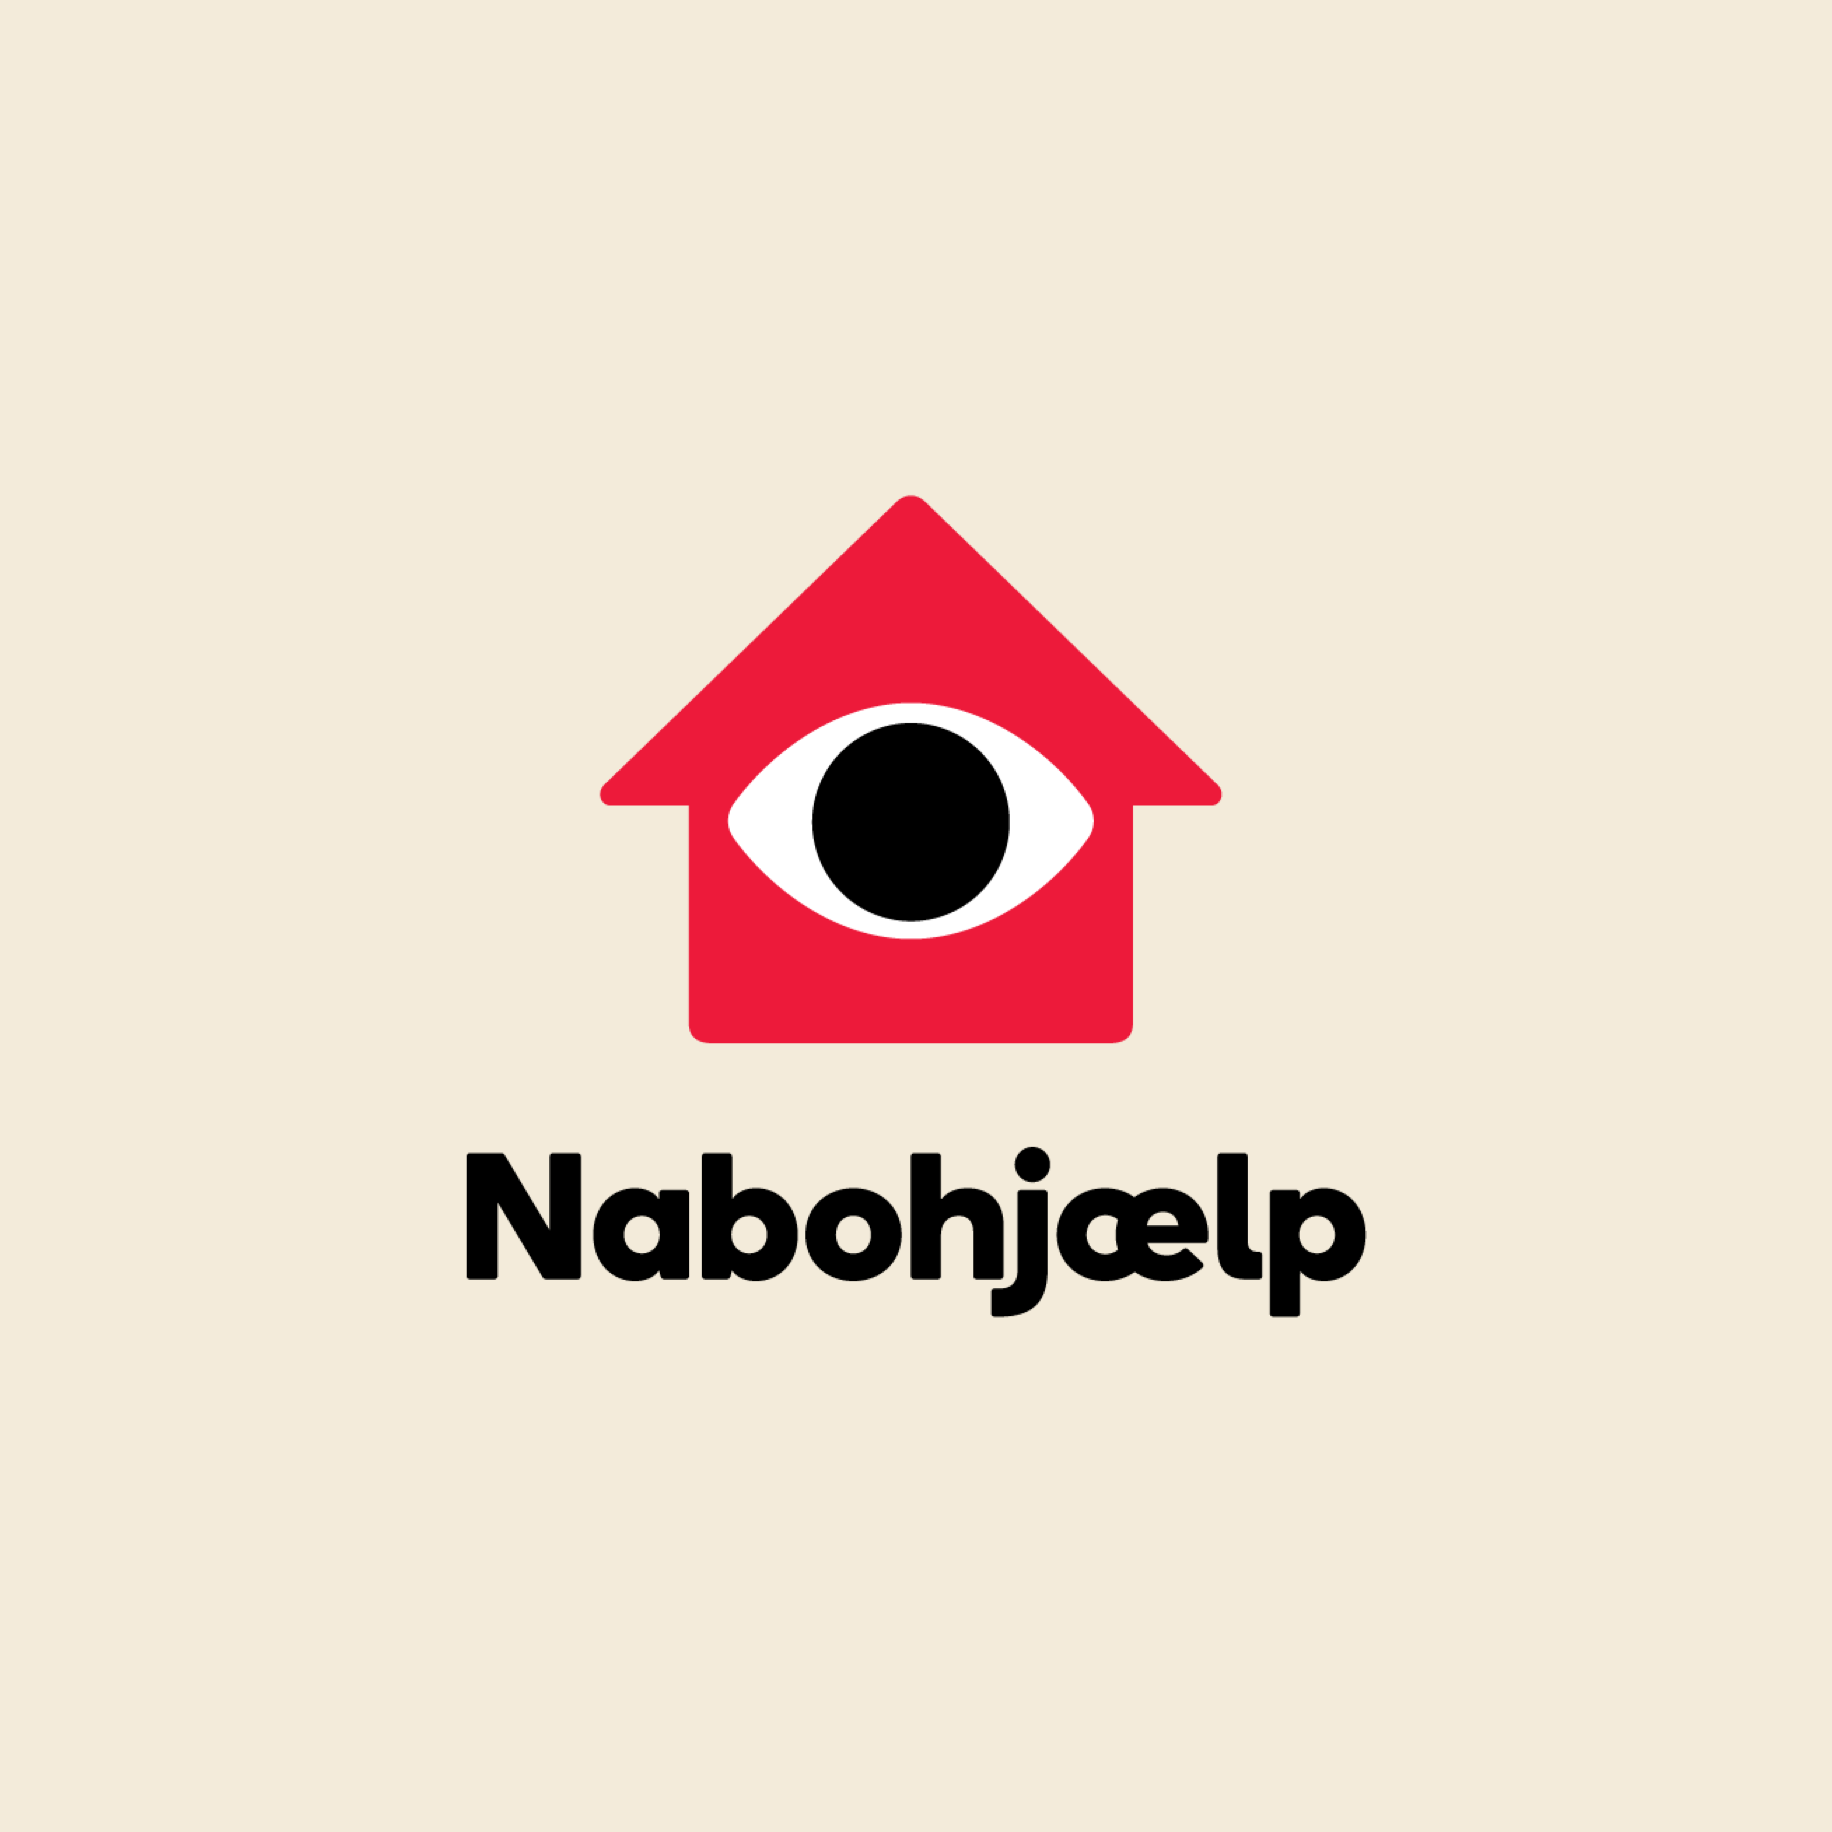 ovetone-nabohjaelp-logo